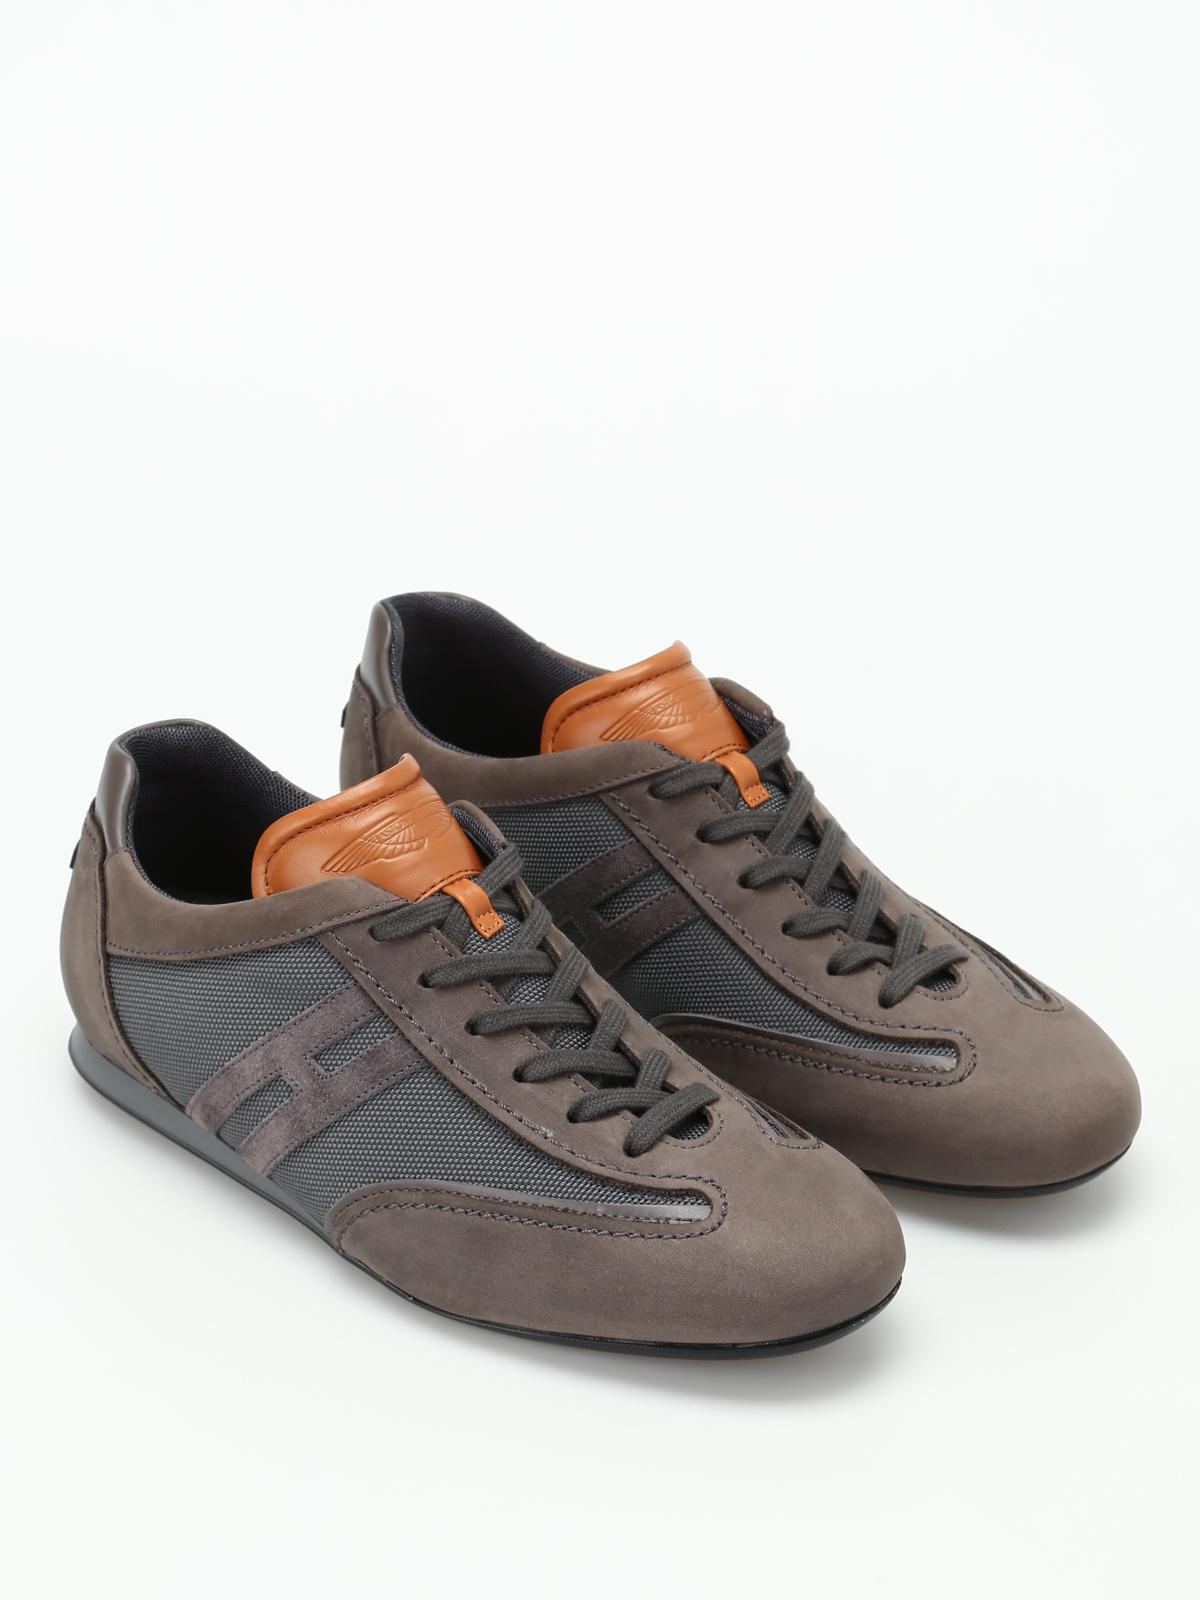 Hogan Olympia Aston Martin Sneakers Trainers H1m0570z910hms843n